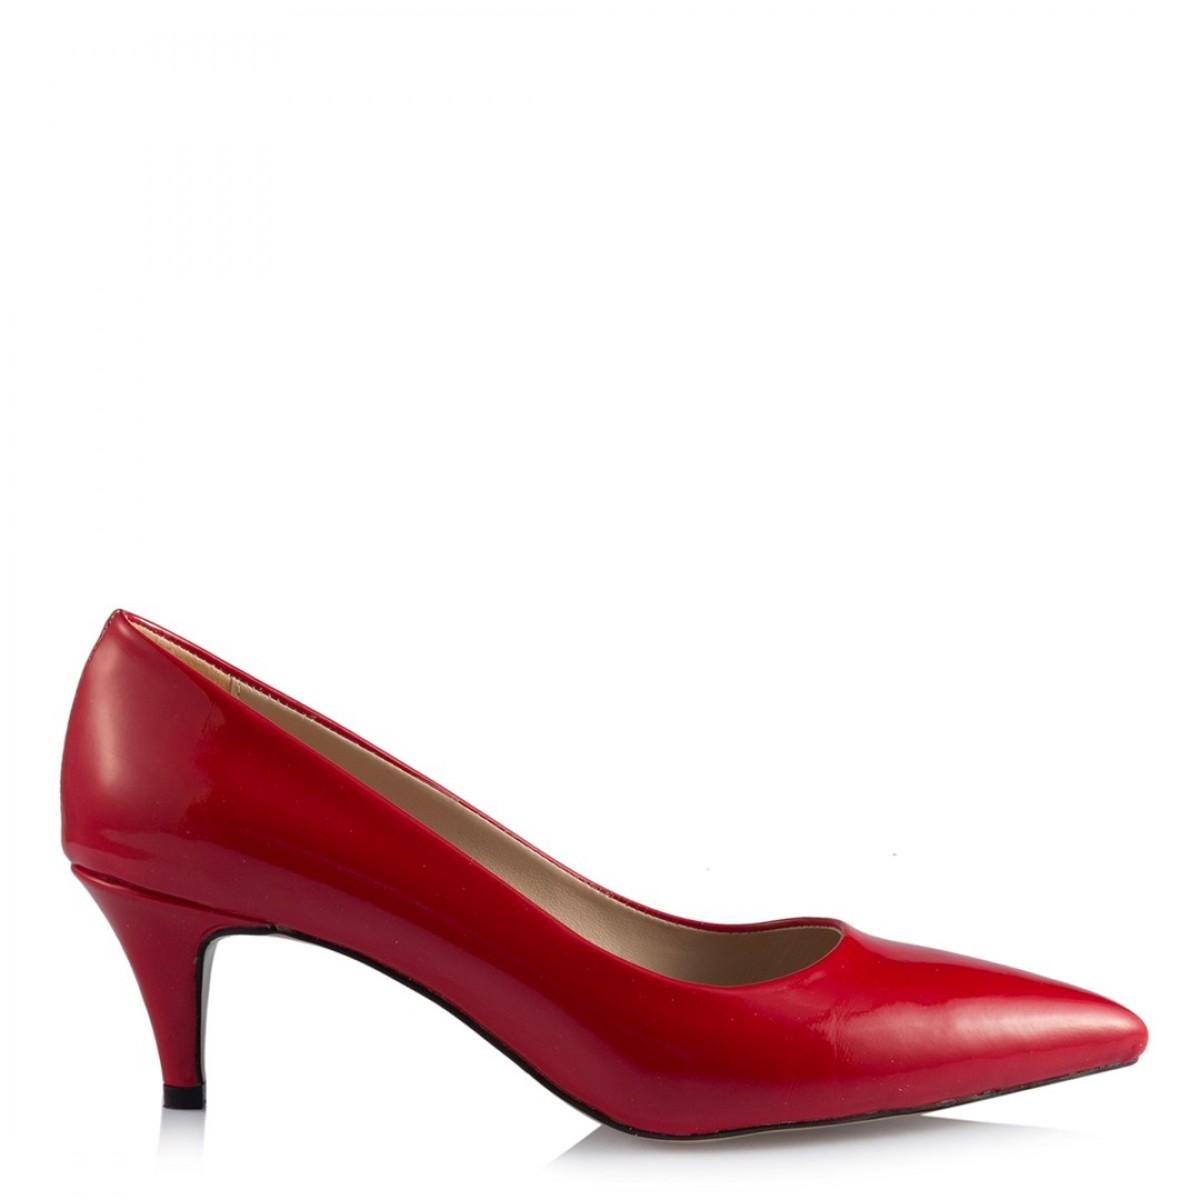 Stiletto Az Topuklu Kırmızı Rugan